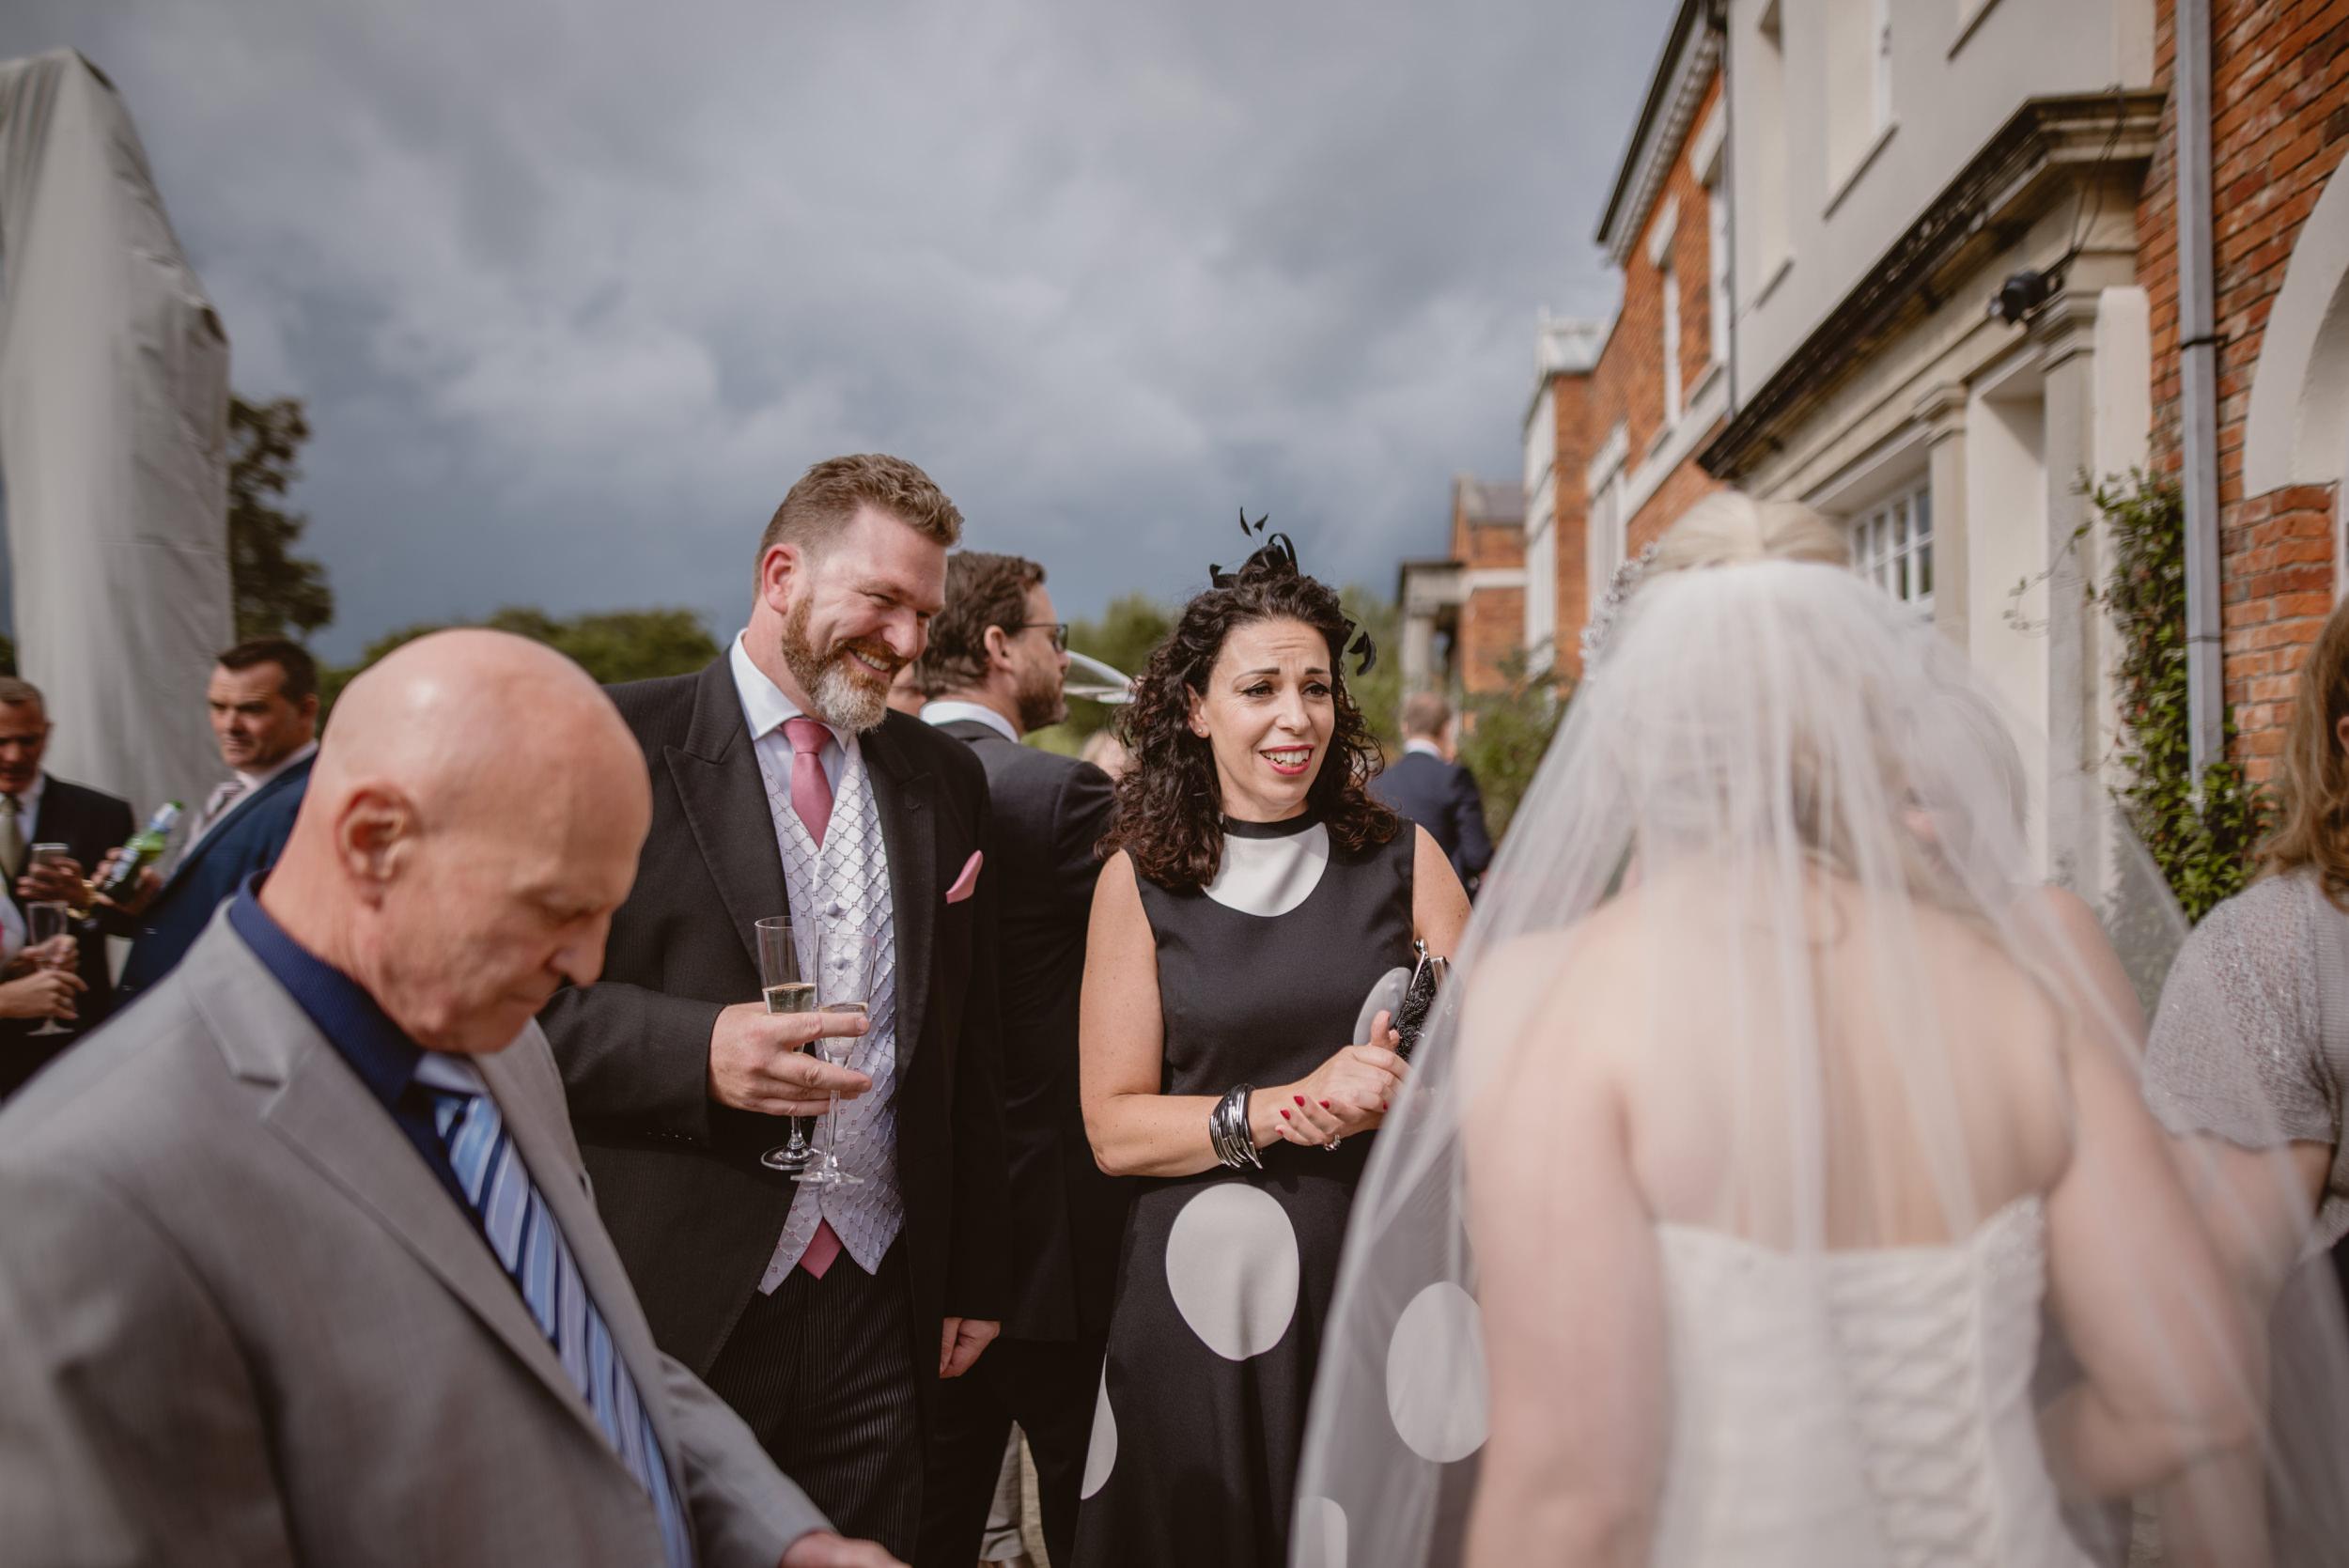 Trisha-and-Roger-wedding-The-Priory-Church-and-Chewton-Glen-Hotel-Christchurch-Manu-Mendoza-Wedding-Photography-335.jpg